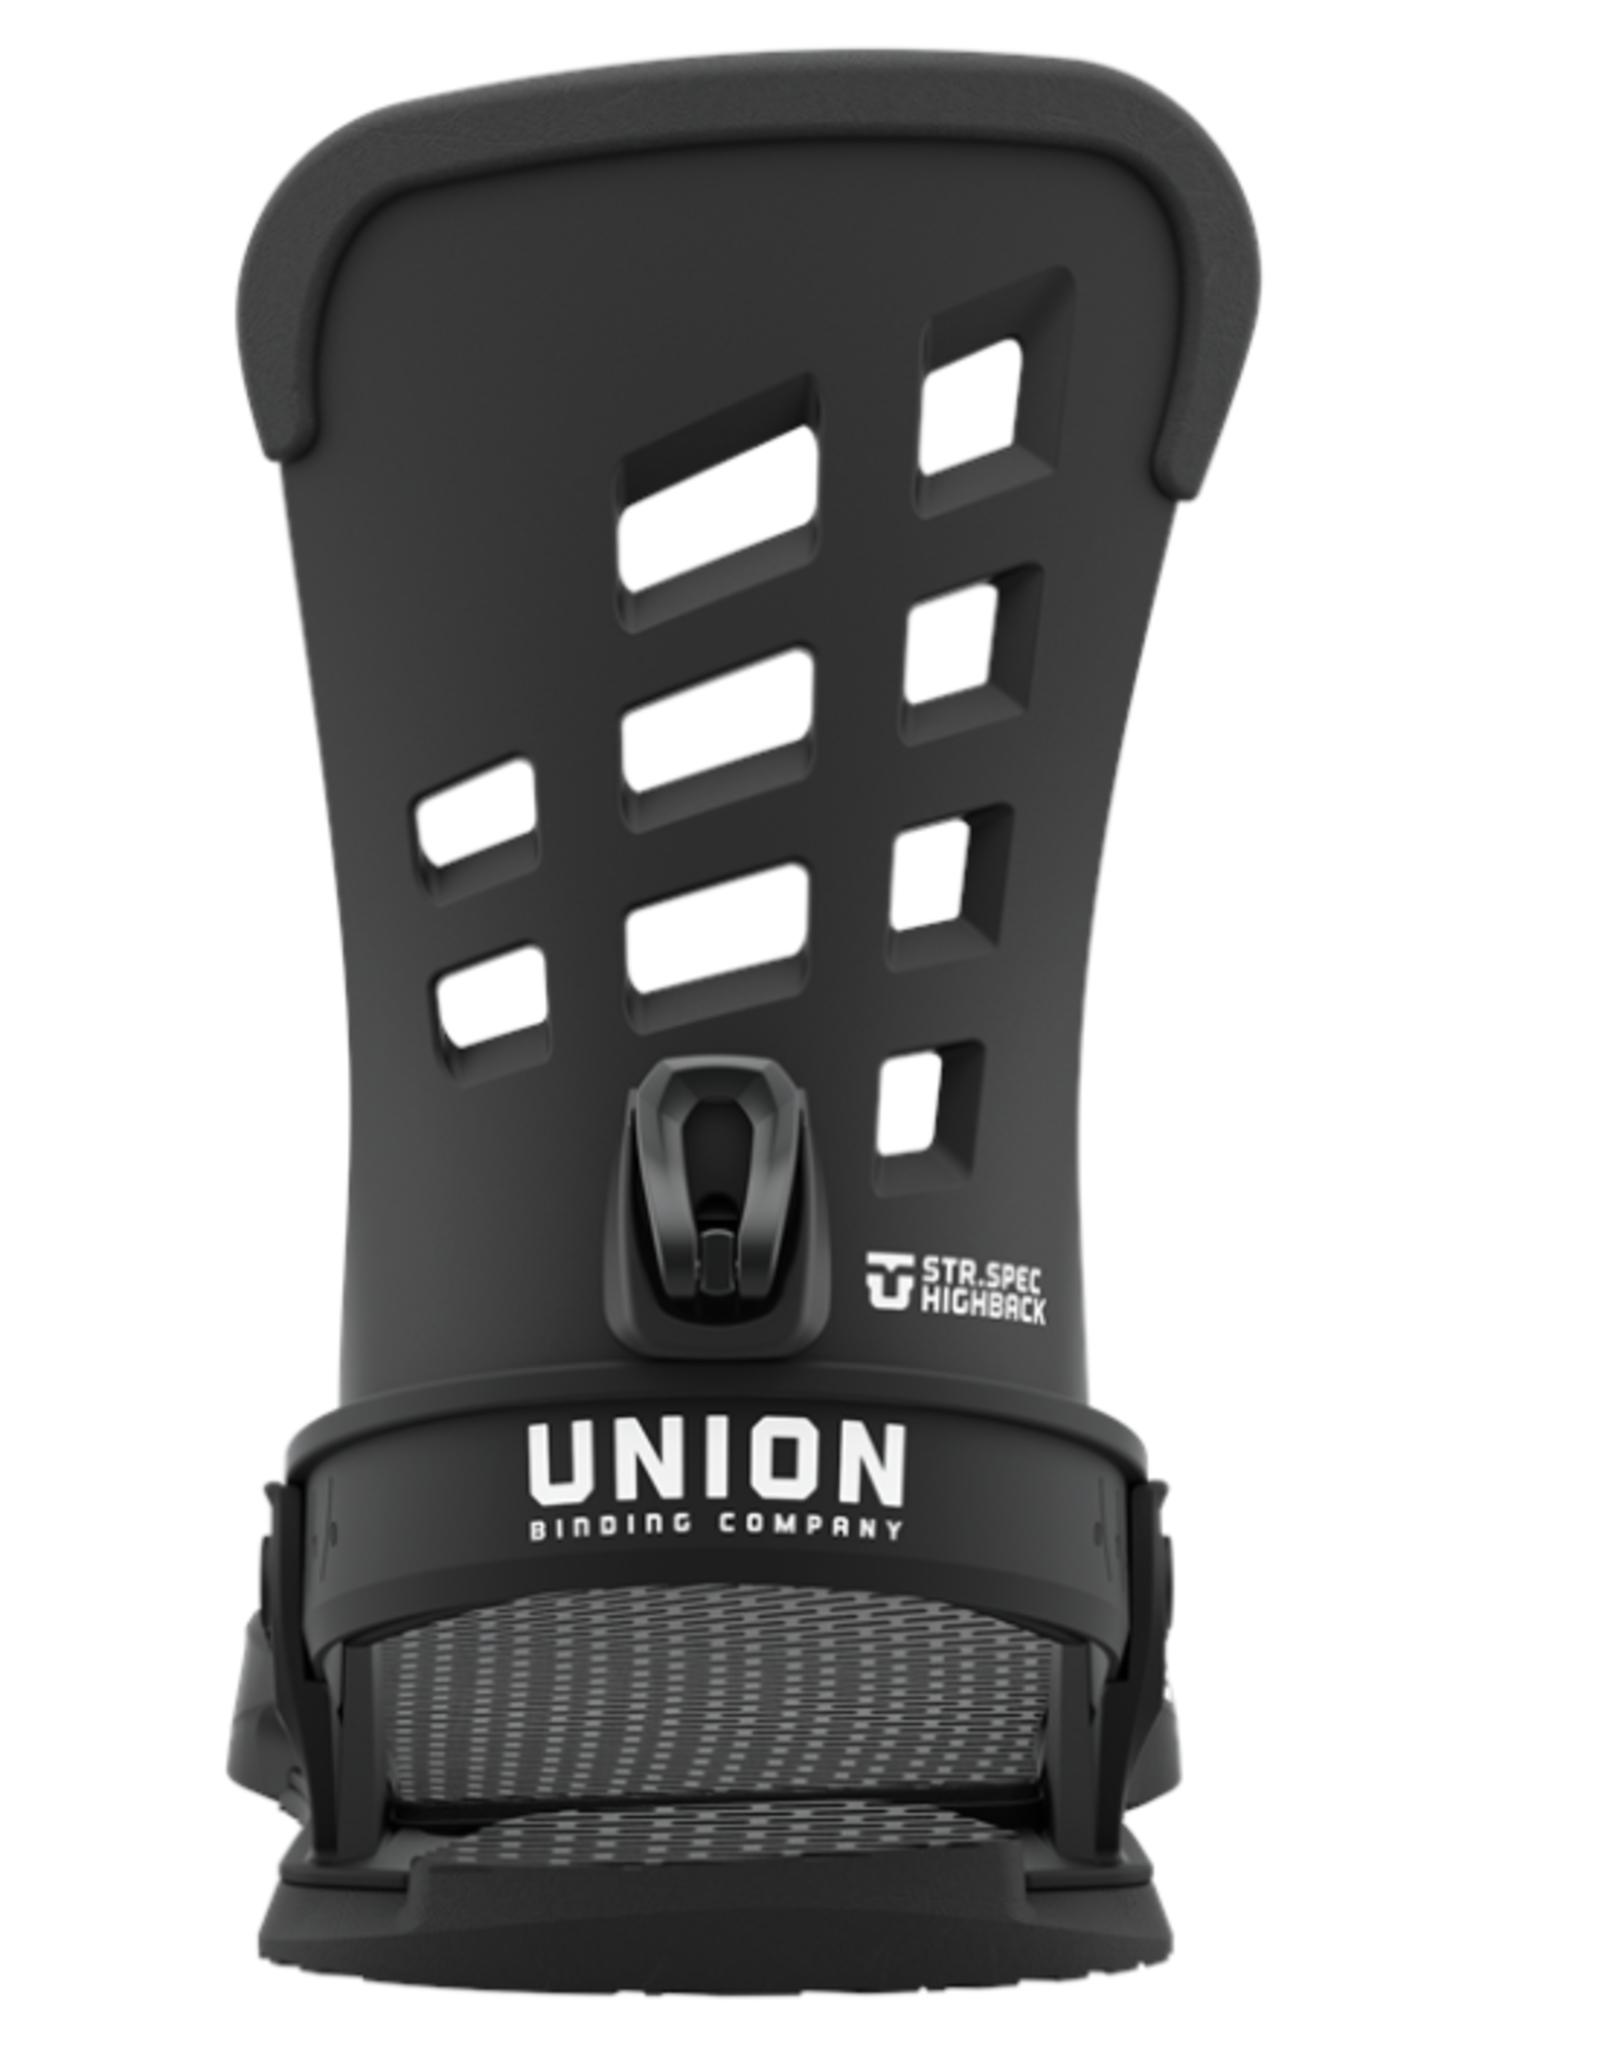 UNION Union Men's STR Bindings Black 2022